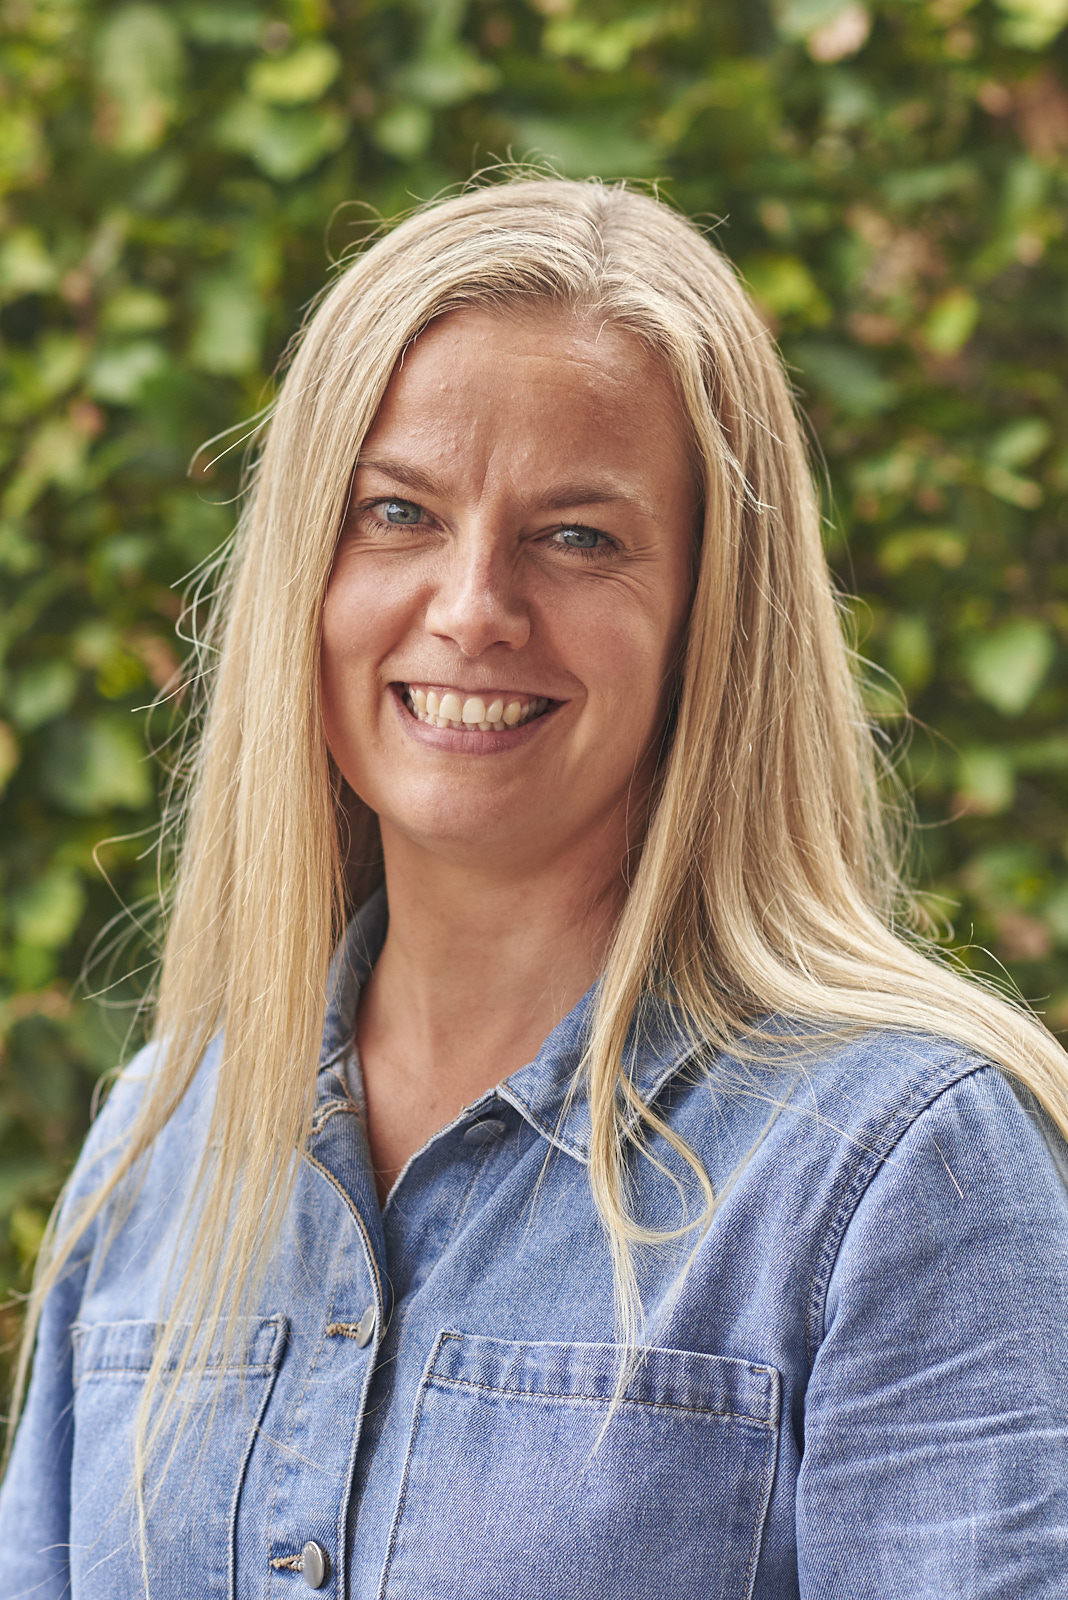 Lene Kirstine Hougaard